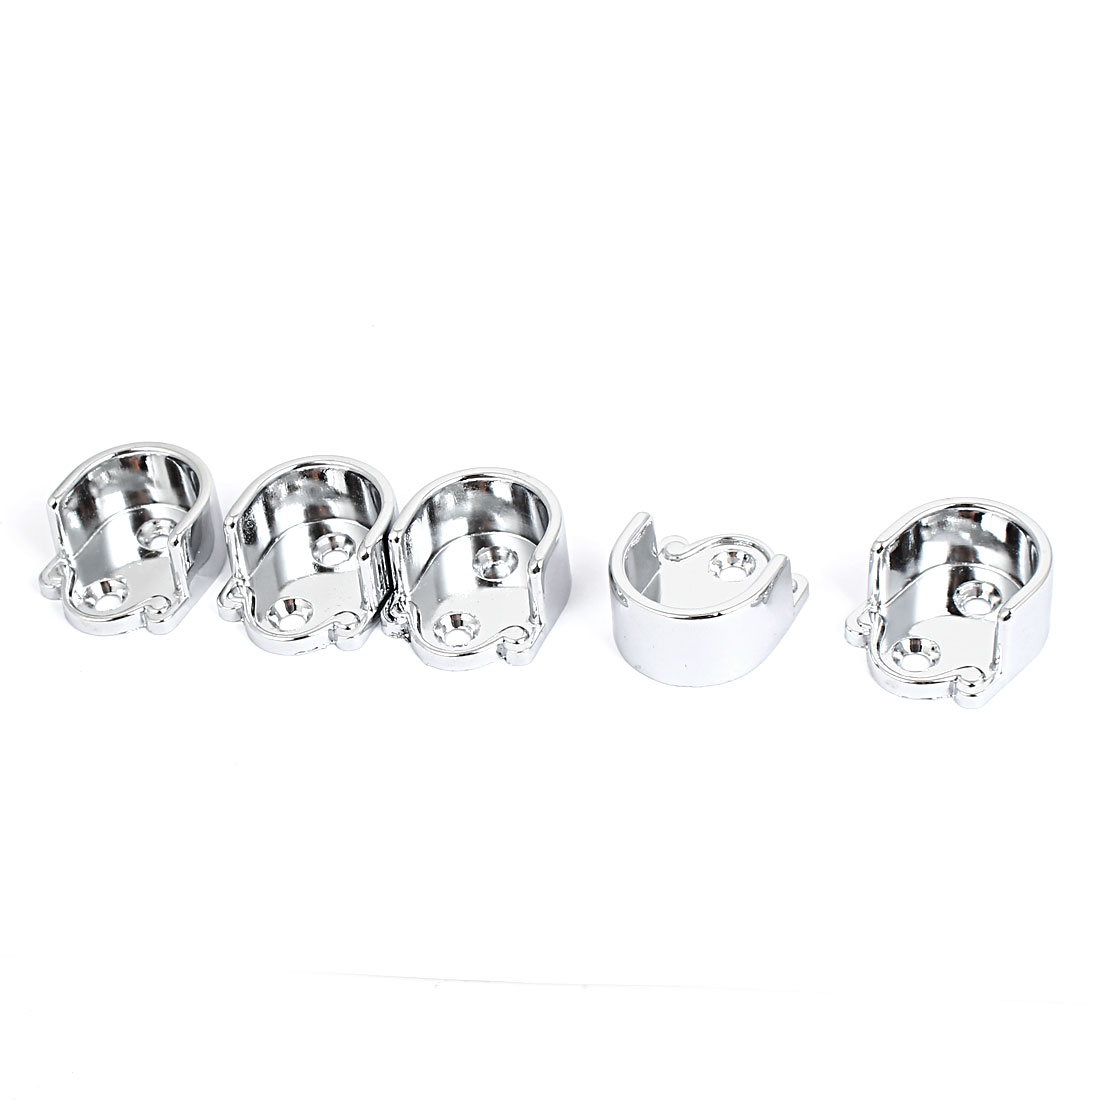 Metal 22mm Dia Clothes Closet Rod Flange Holder Bracket Silver Tone 5pcs